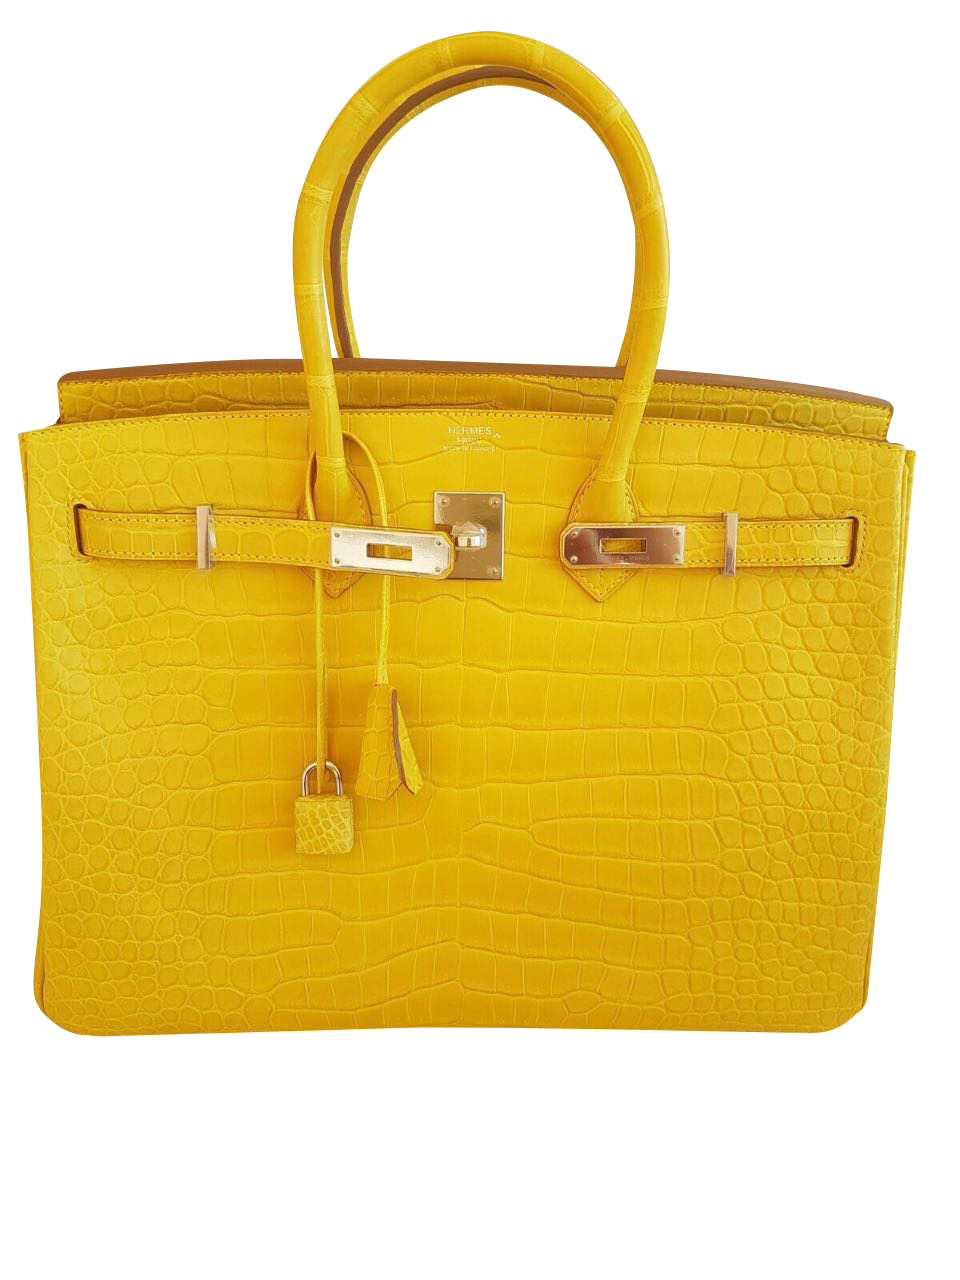 77a6aead95de Sac Hermès Birkin 30 Alligator Jaune Mimosa   Luxe for elle ...